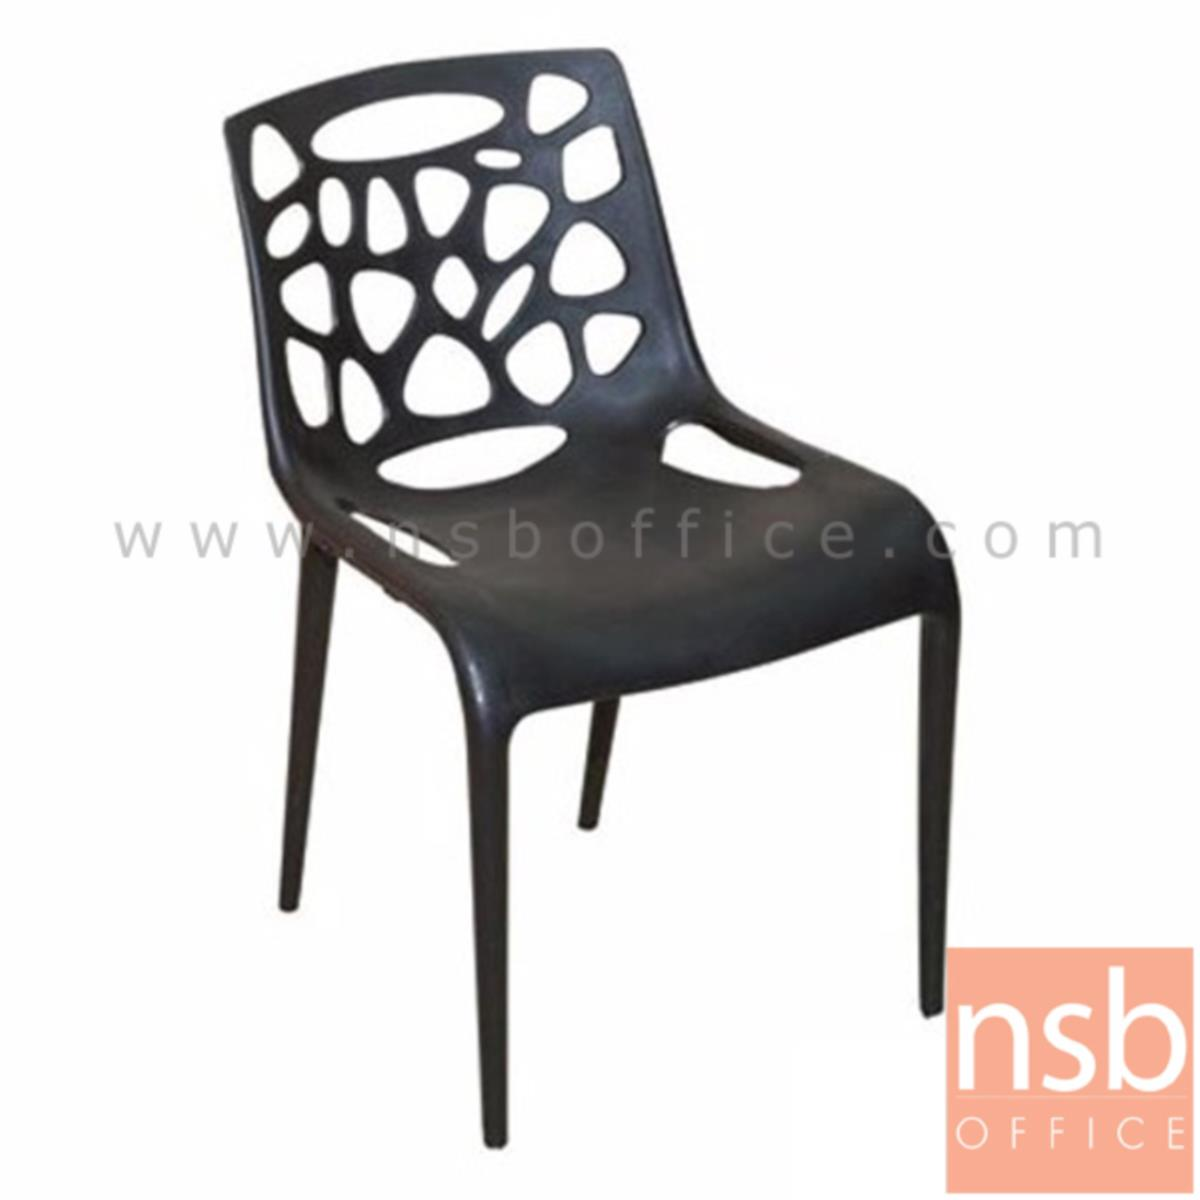 B11A038:เก้าอี้พลาสติกล้วน(PP) รุ่น Eiffel (ไอเฟล) ขนาด 57W cm.